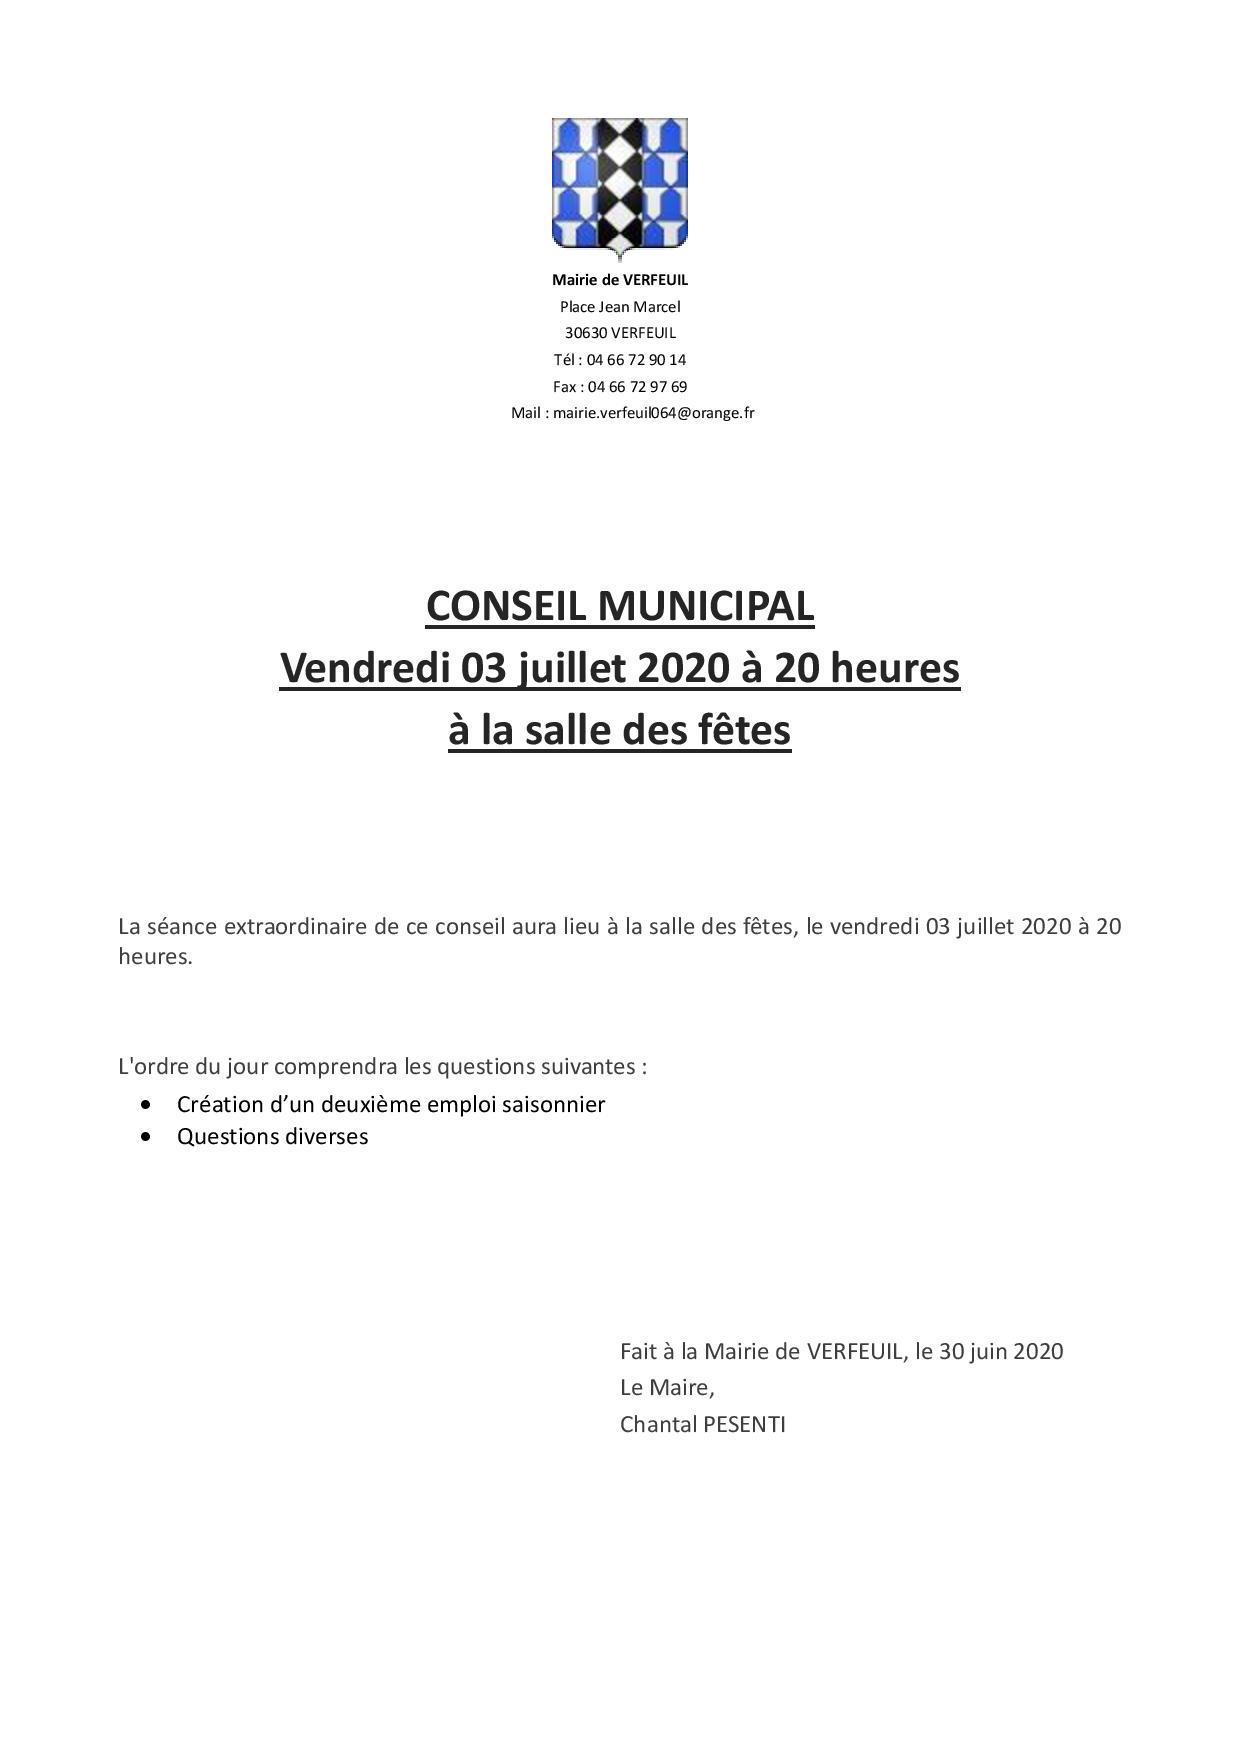 20200703 affichage cm 1 page 2